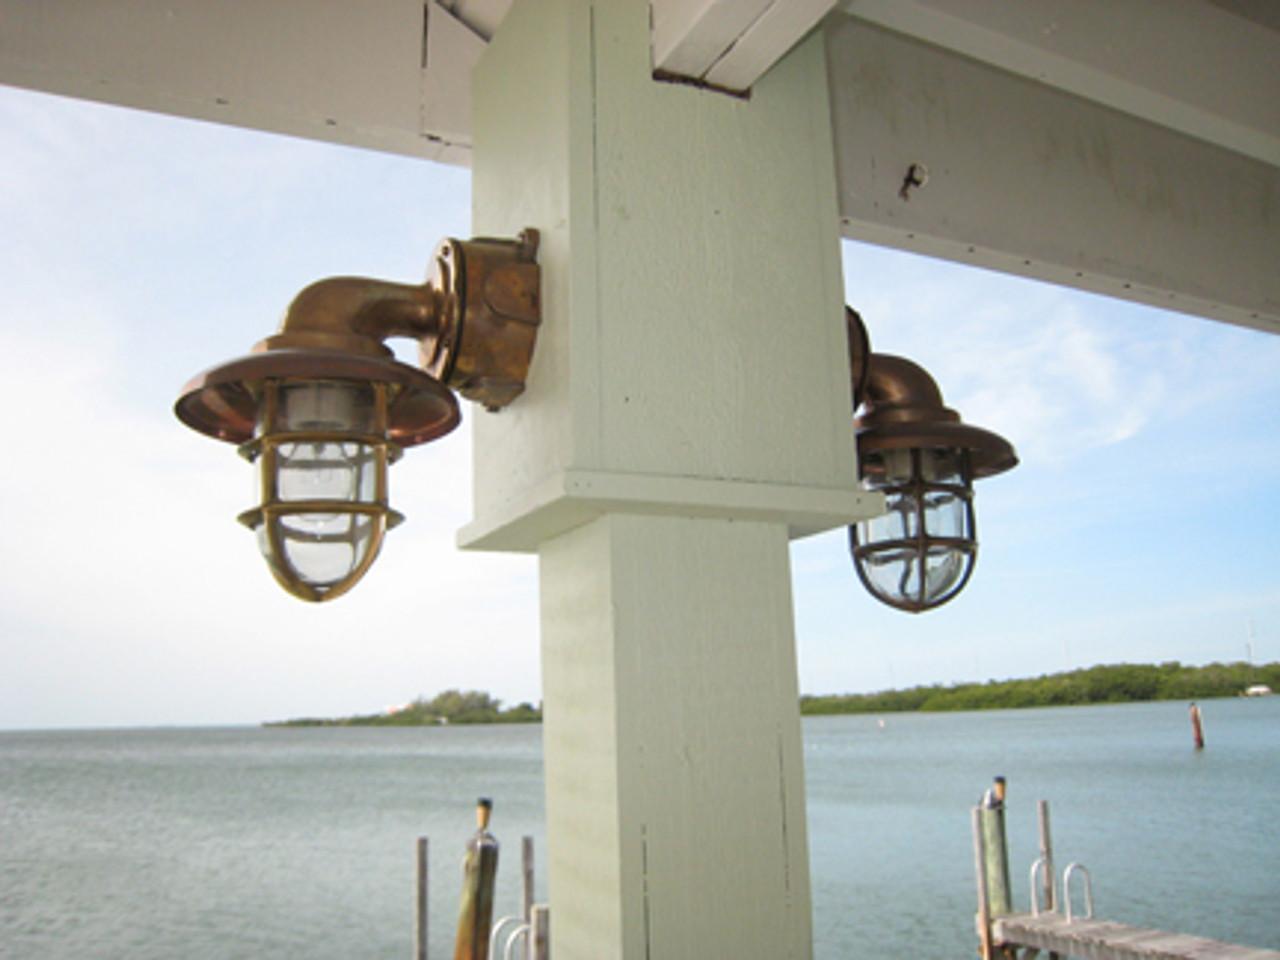 Dual passageway dock lights built for heavy duty use